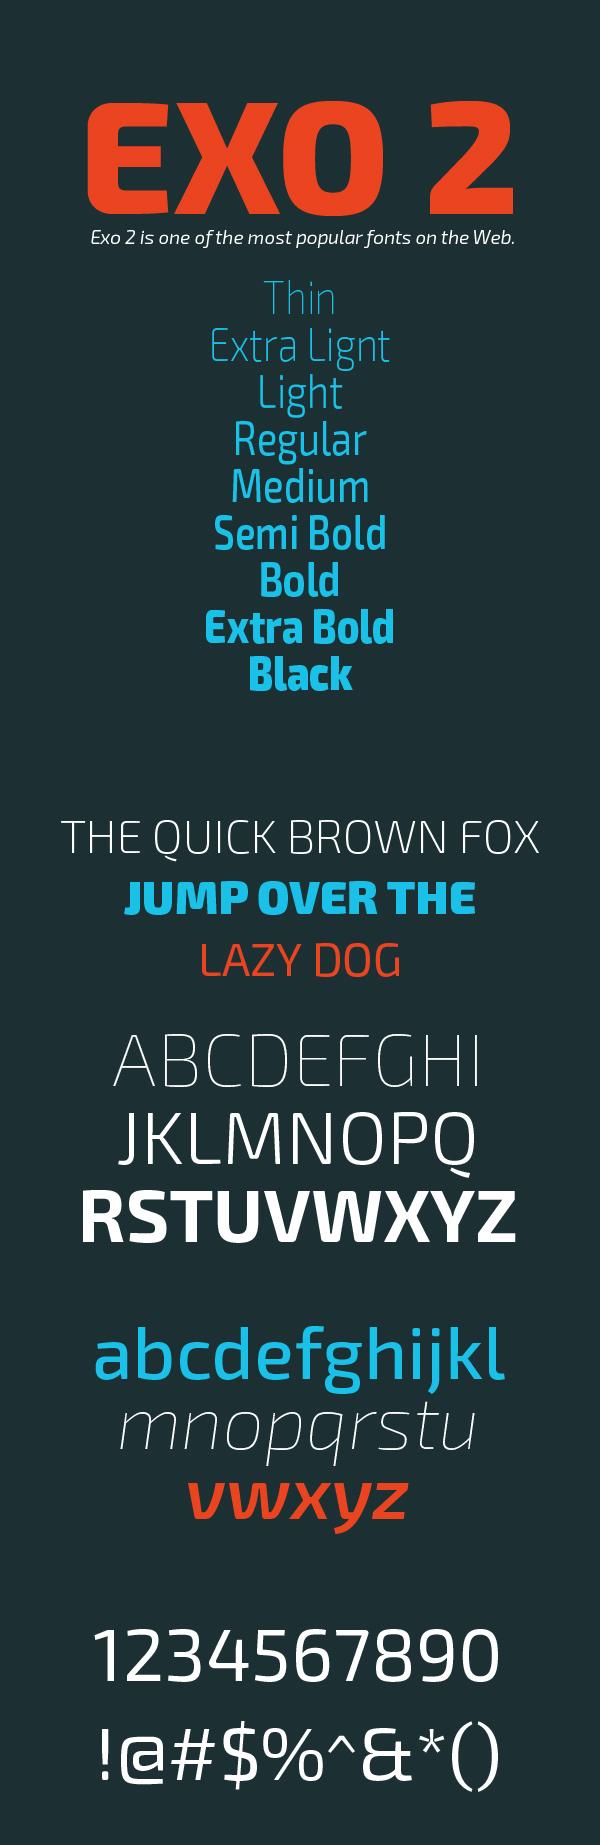 01 Exo 2 Free Font